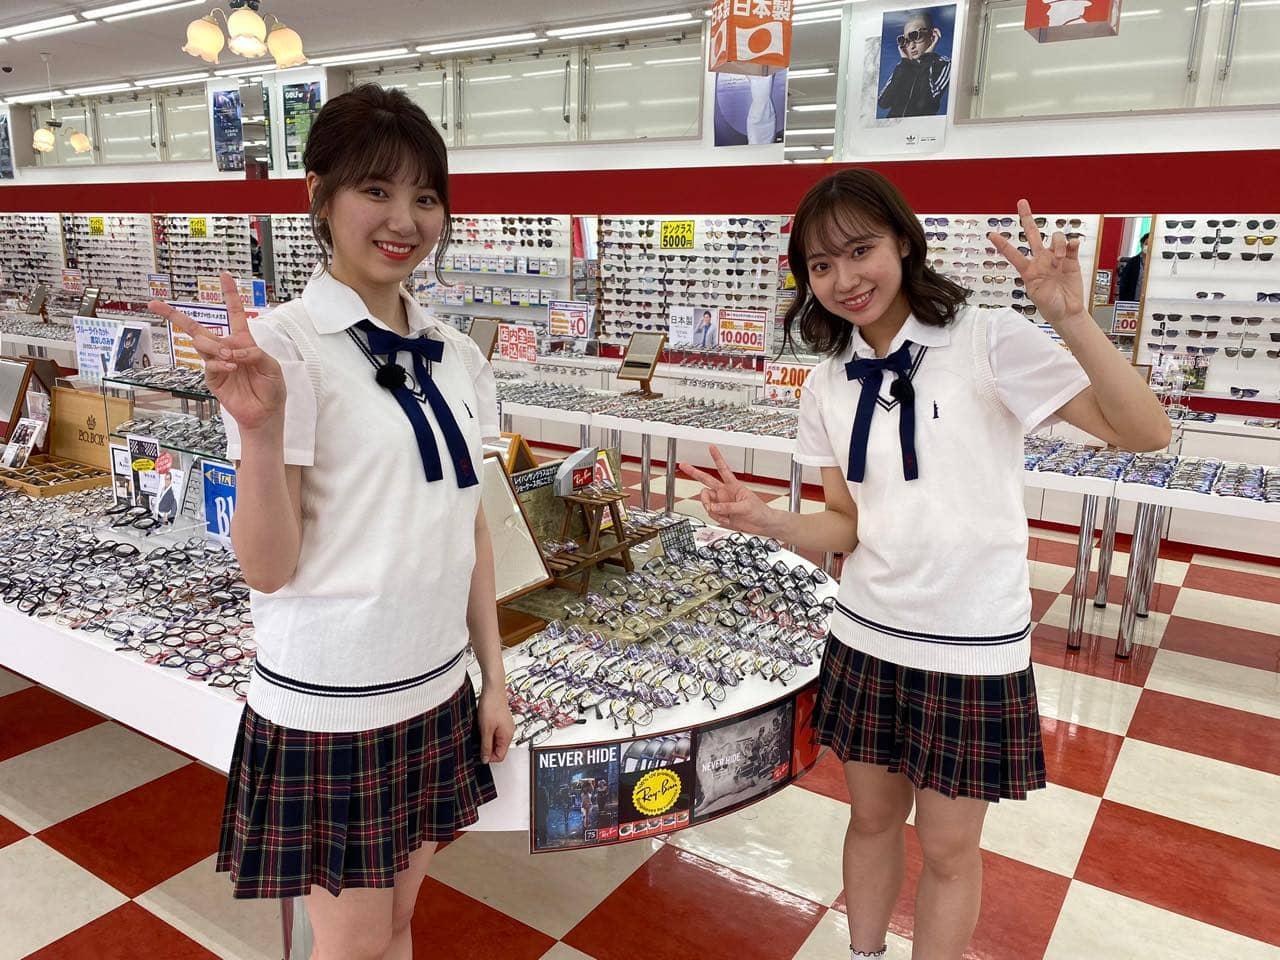 「SKE48は君と歌いたい」日高優月&菅原茉椰がメガネ赤札堂を訪ね店長の男性と出会う